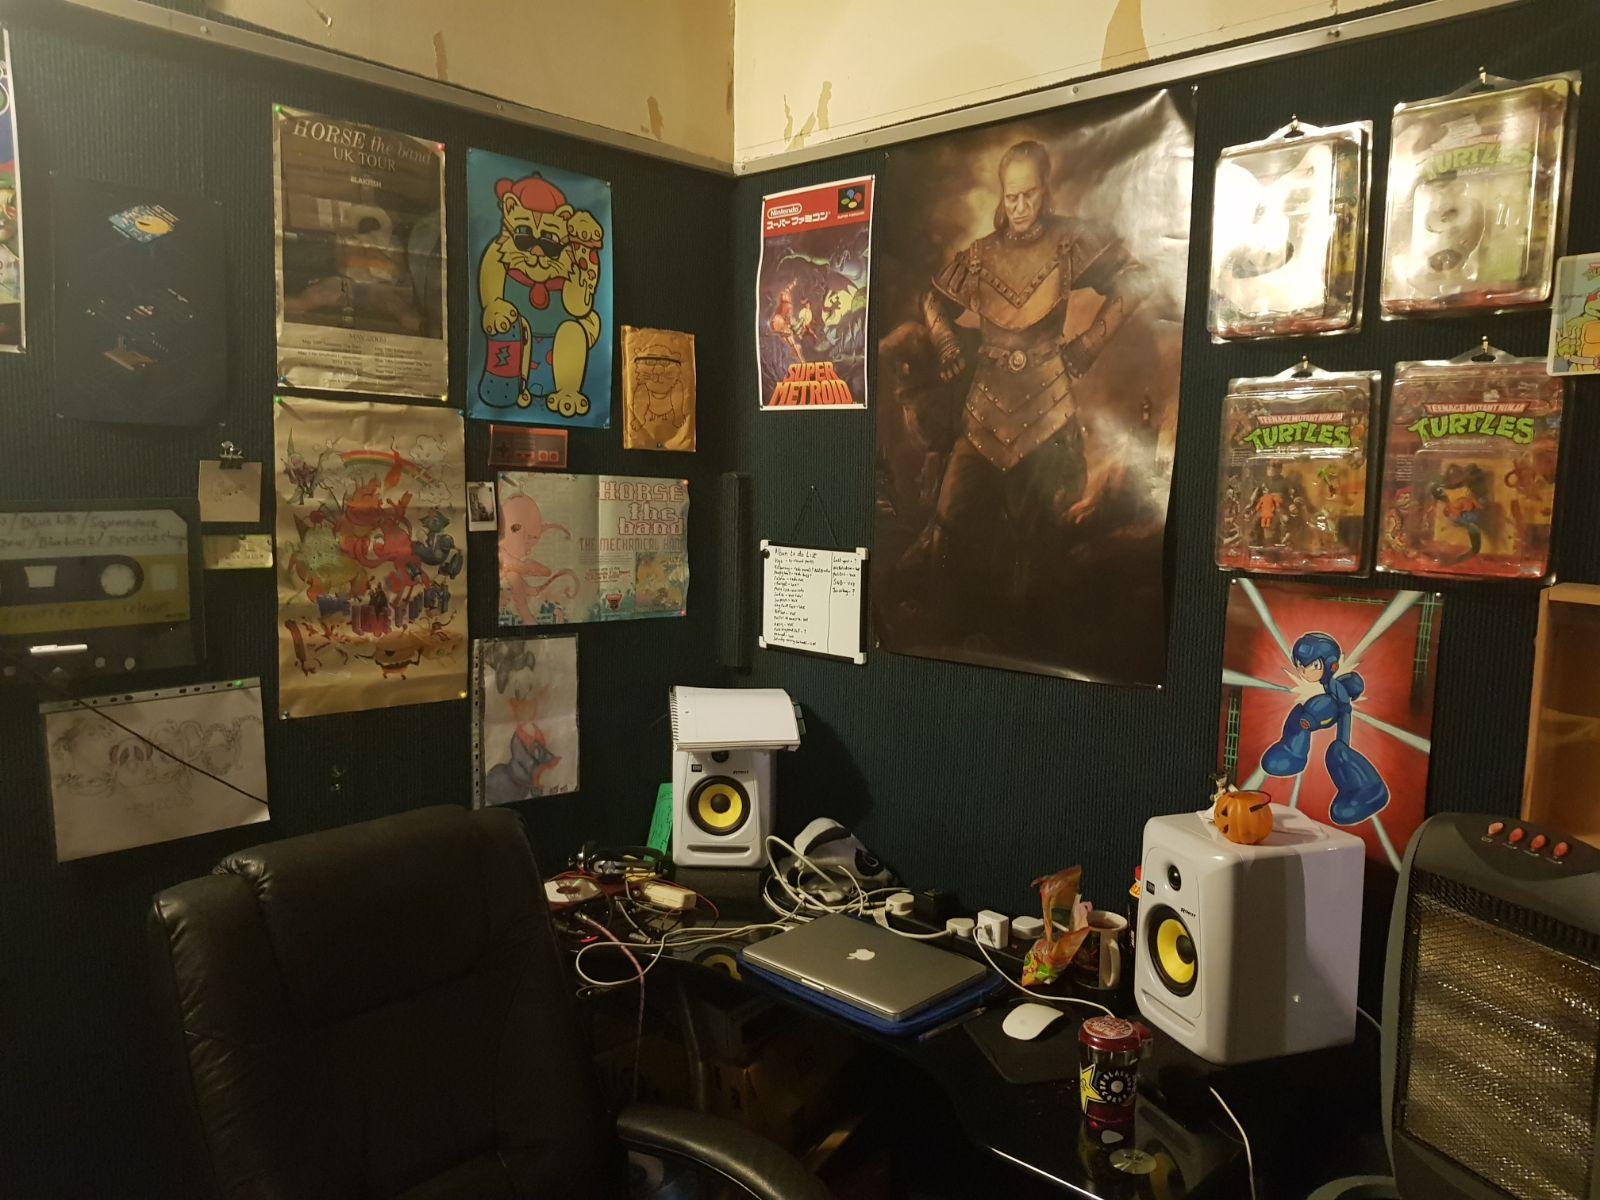 Vigo oversees the creativity process in its entirety at ICFC studios, Aberdeen